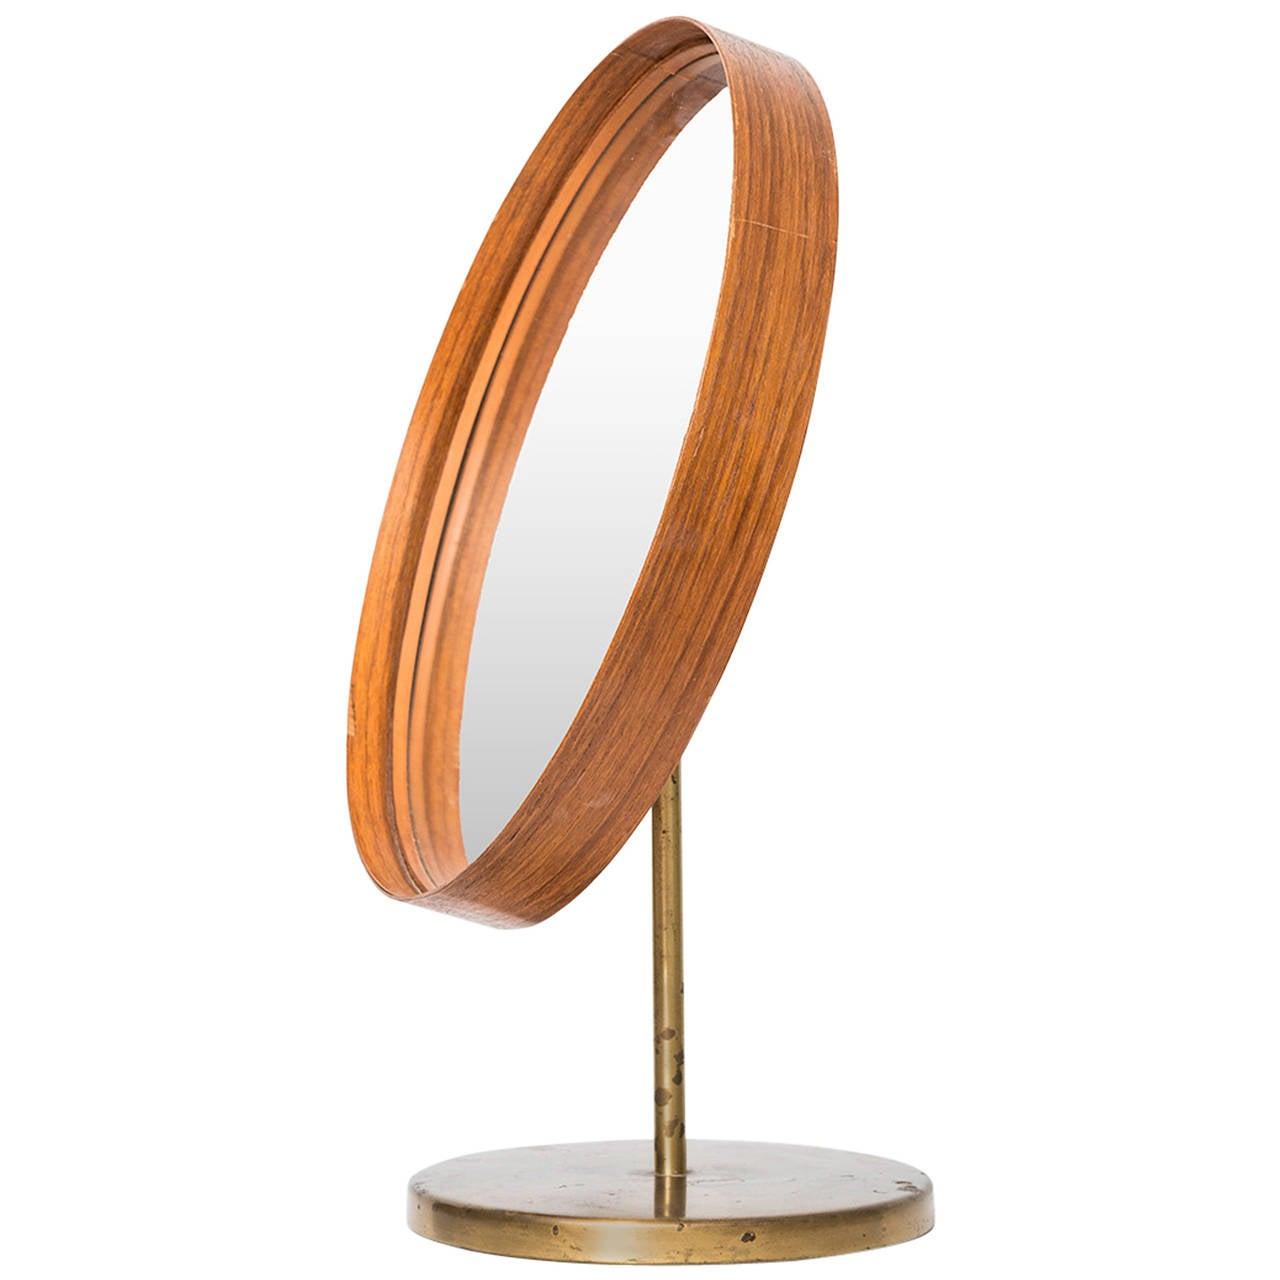 Table Mirror in Teak and Brass by Glasmäster in Markaryd, Sweden